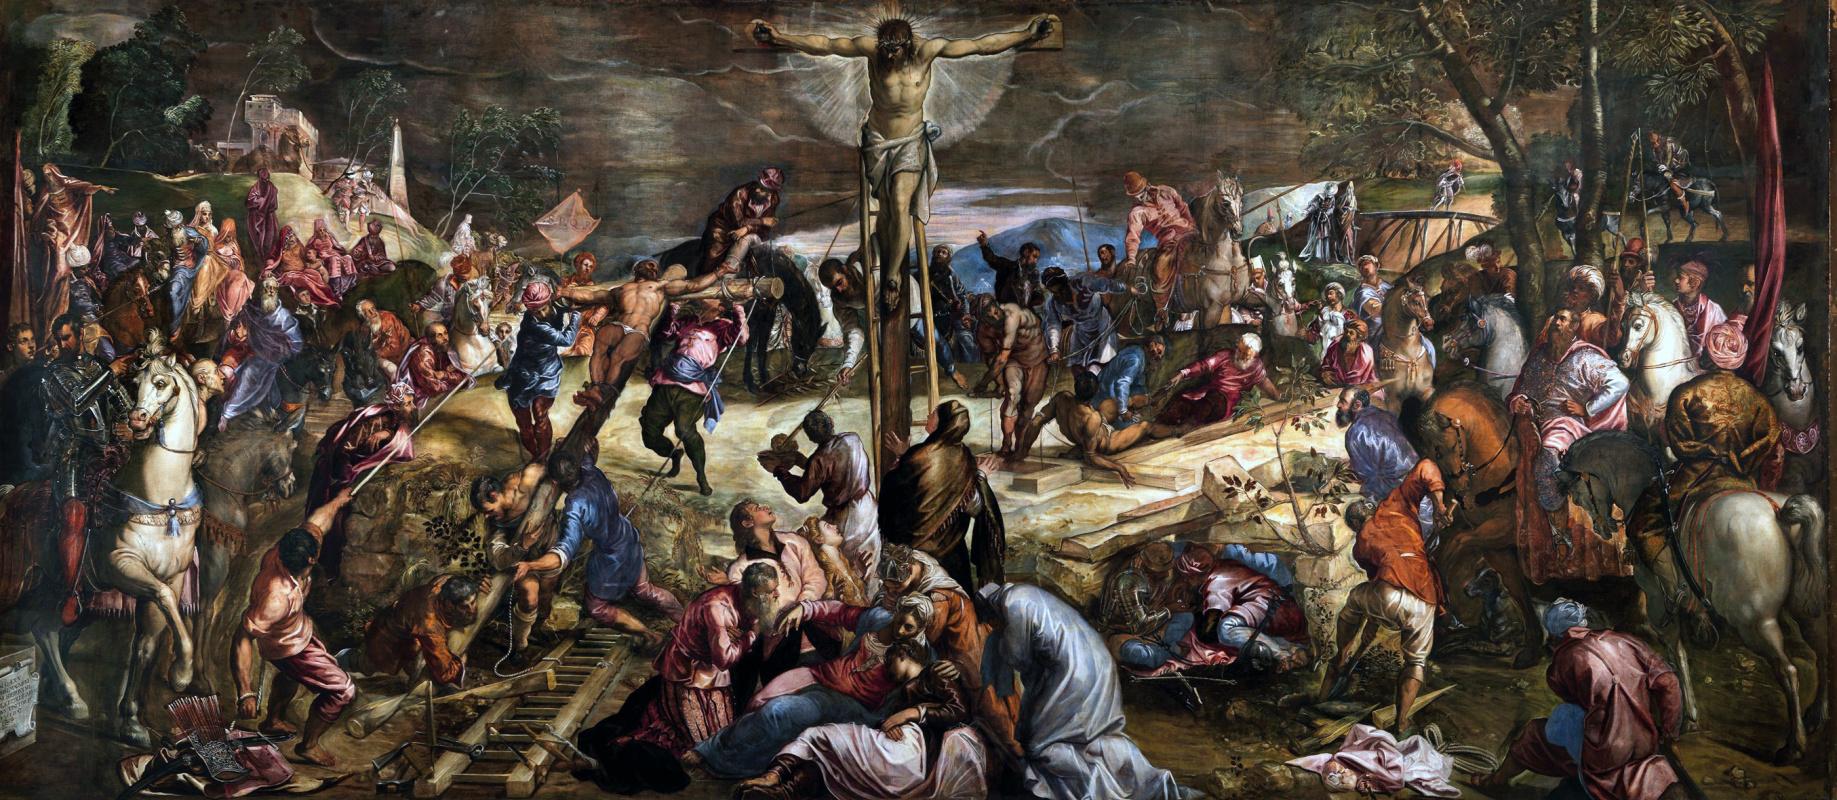 Jacopo (Robusti) Tintoretto. Crucifixion of Christ